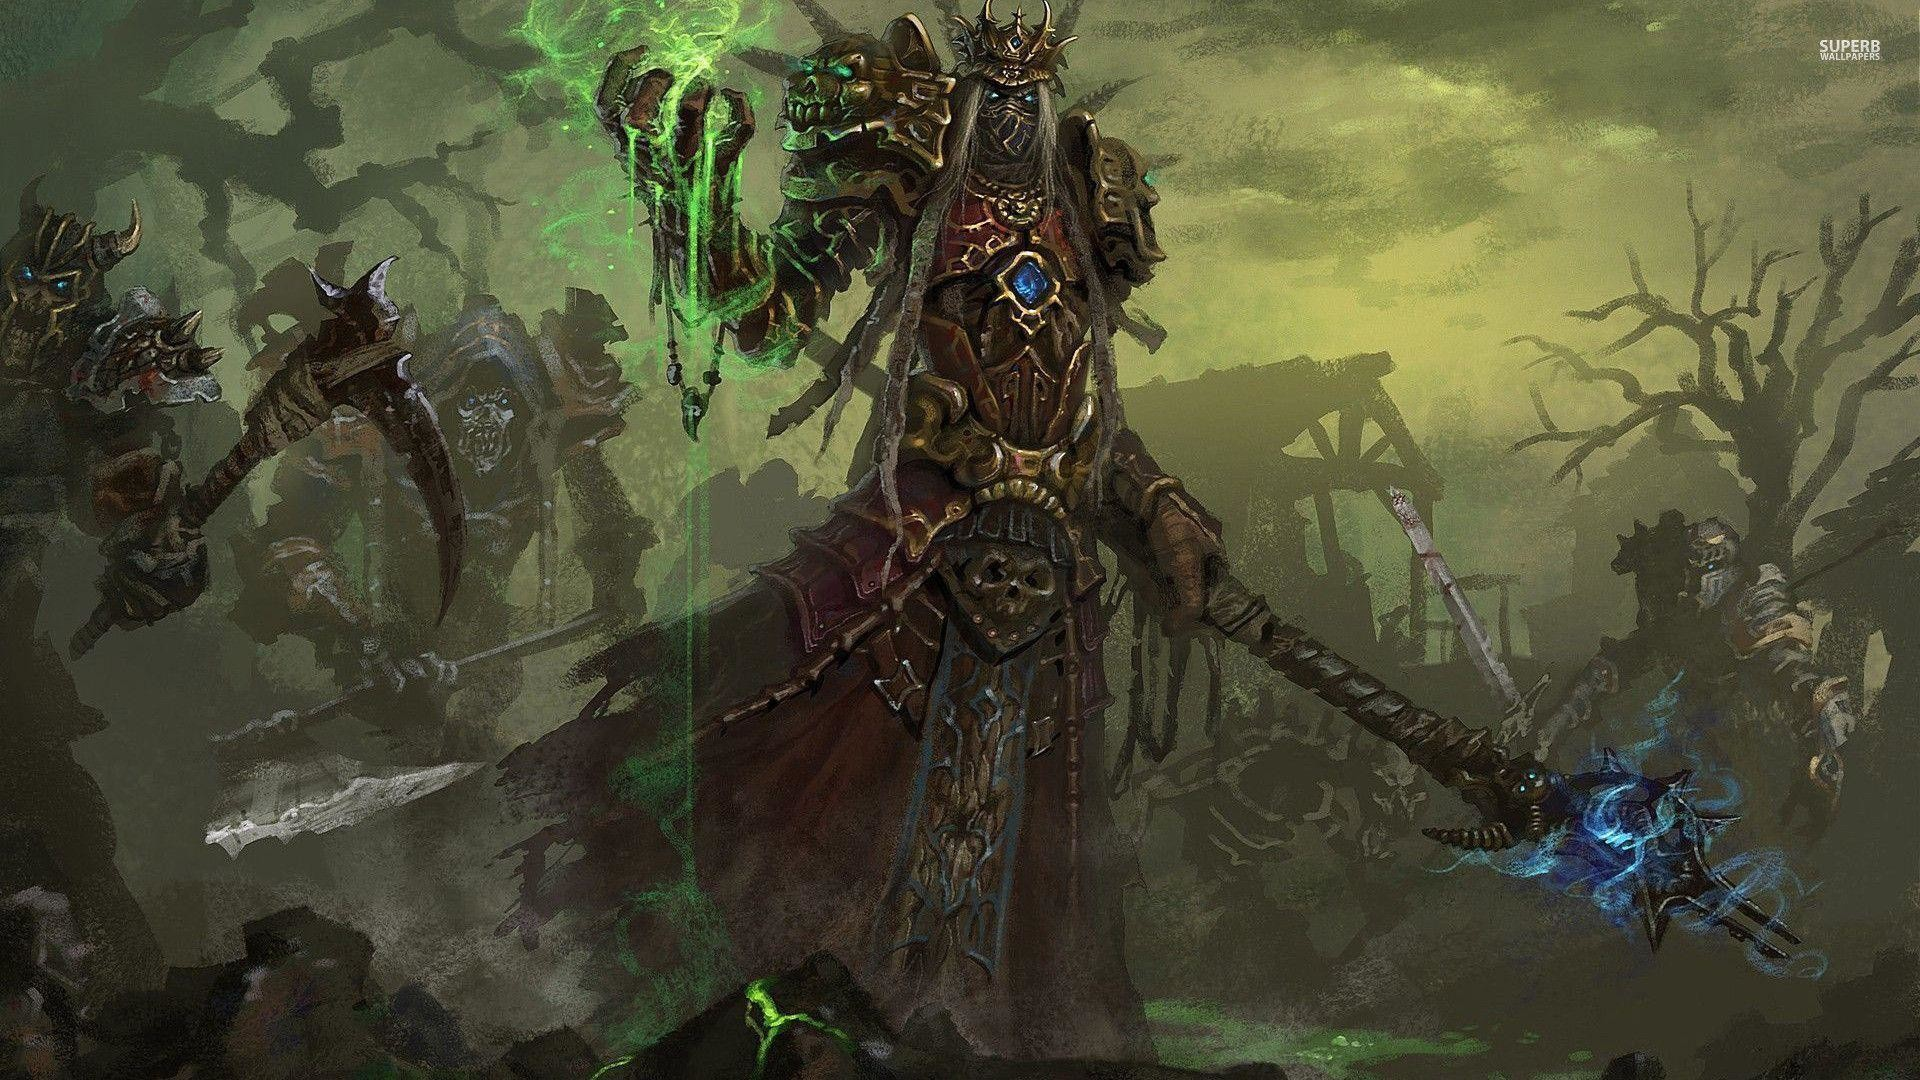 World Of Warcraft Desktop Wallpaper: WoW Warlock Wallpaper (76+ Images